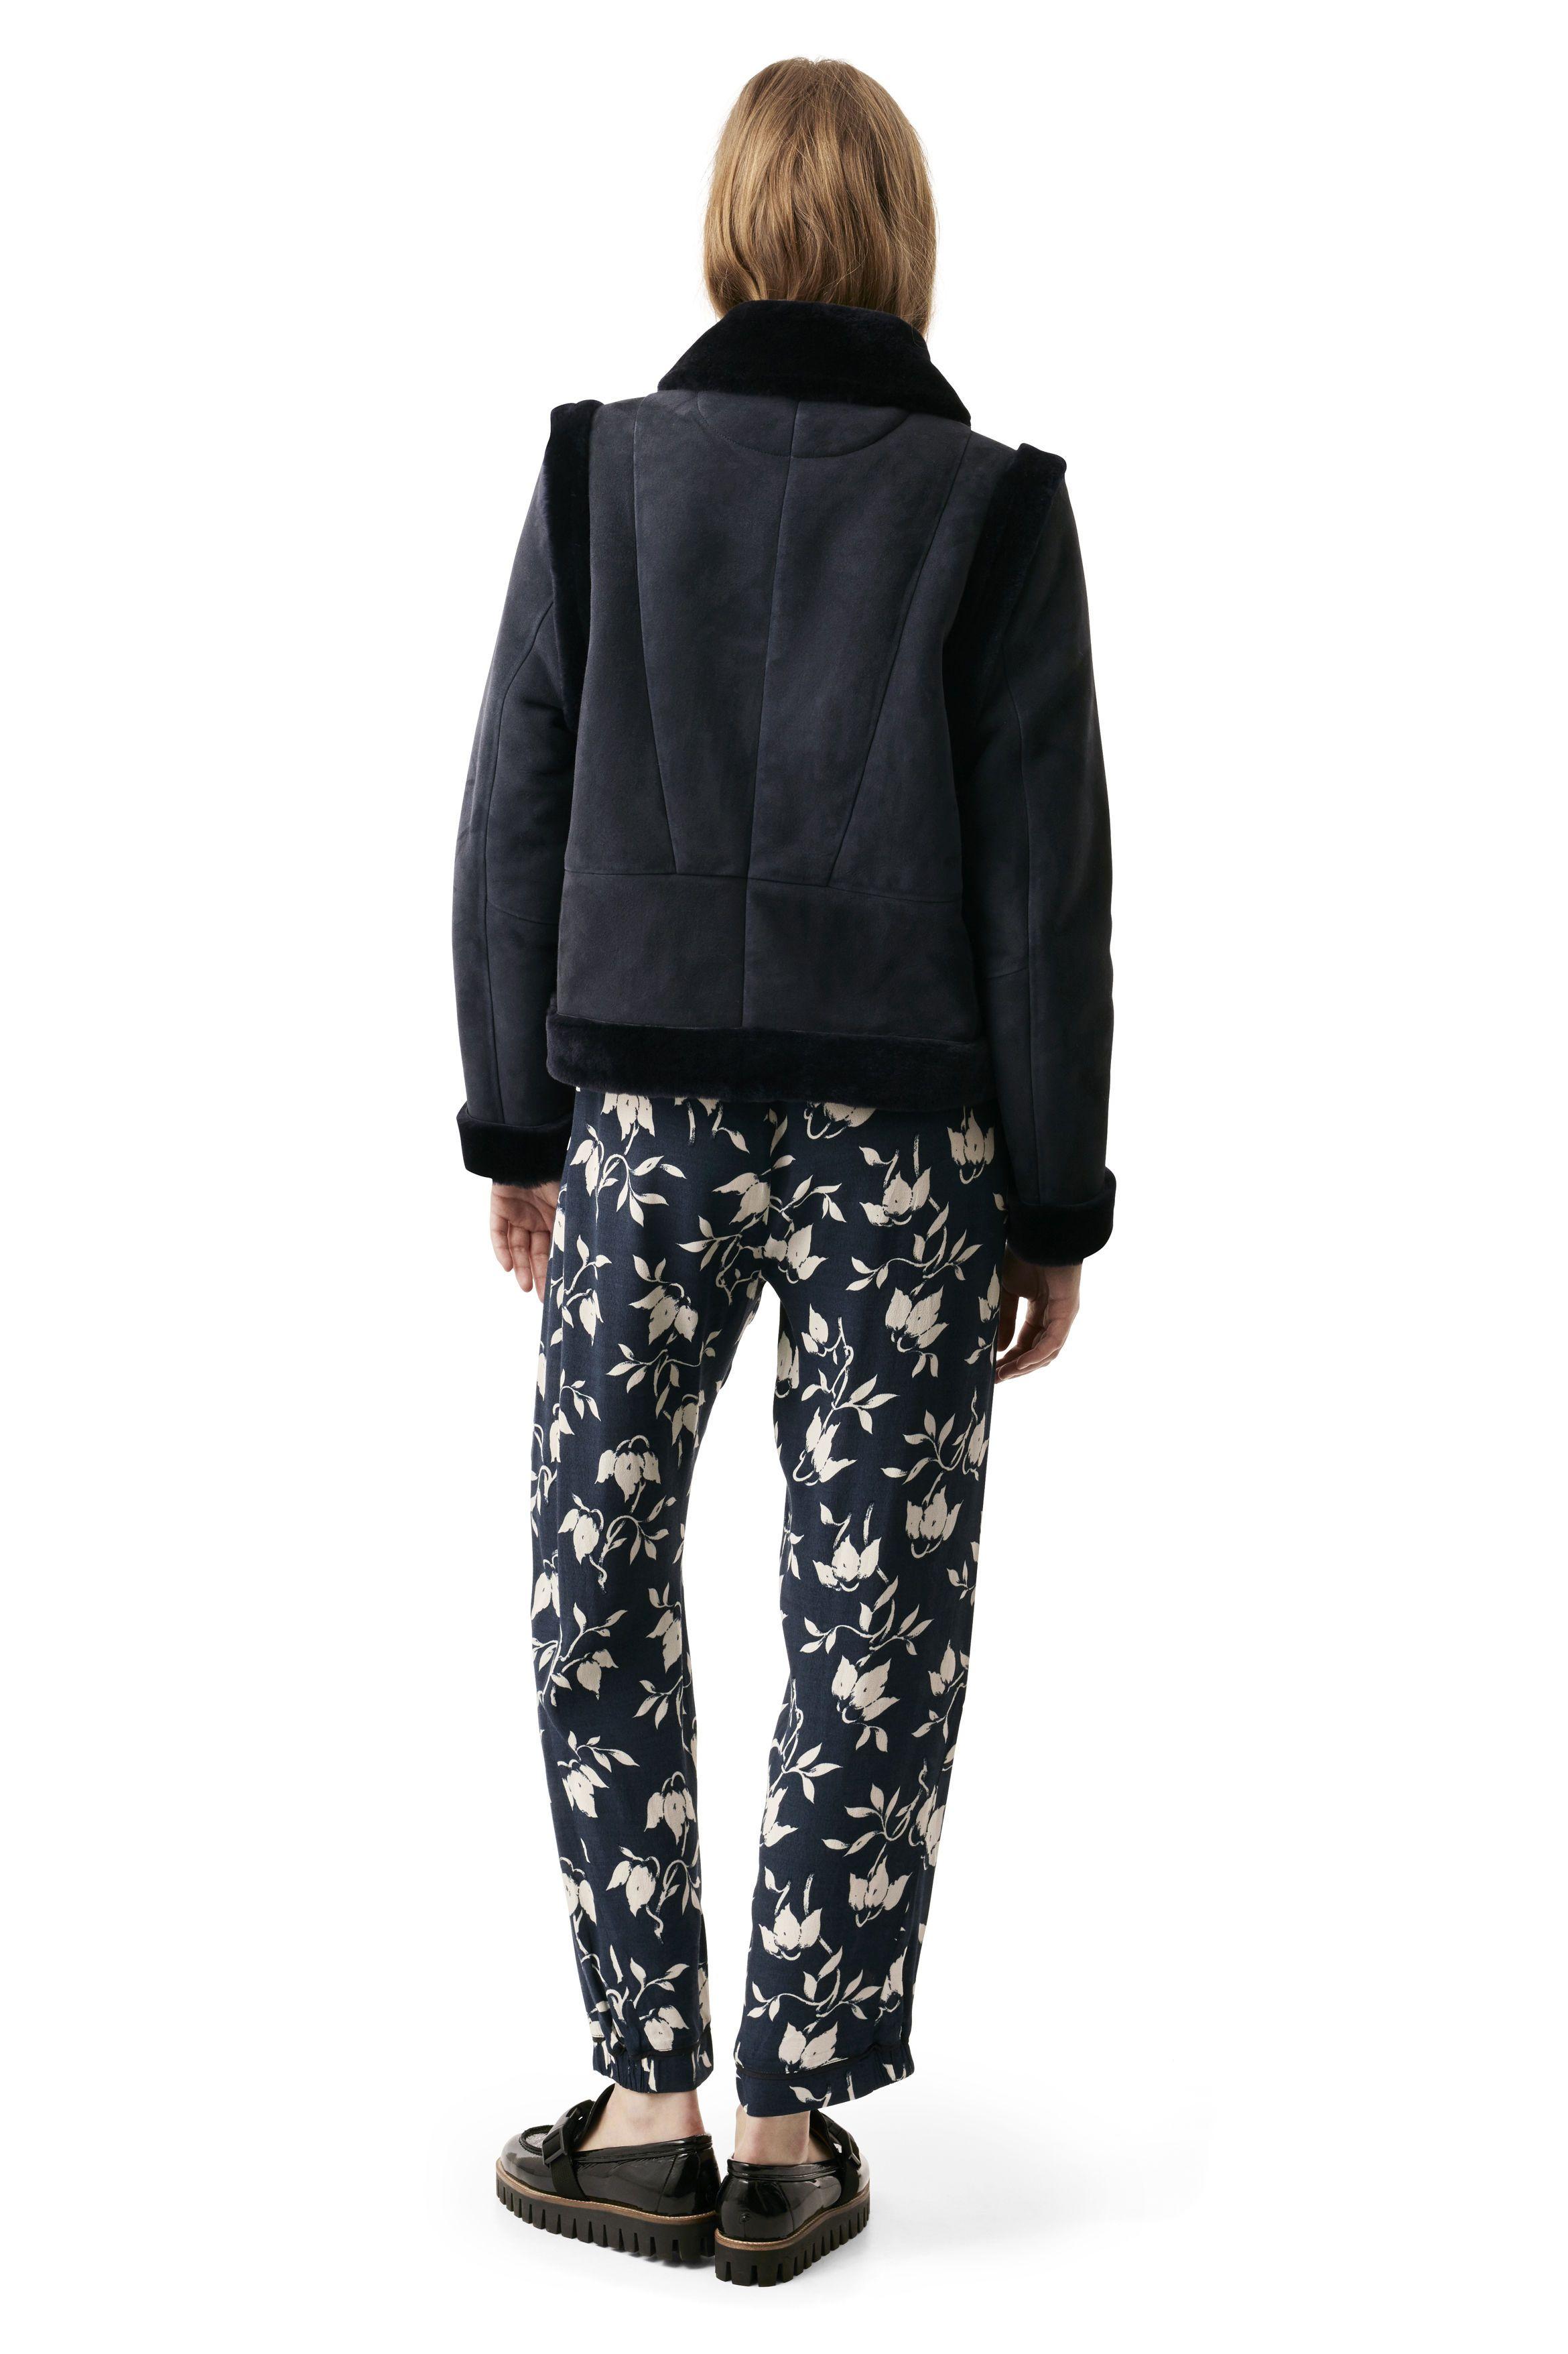 Scott Shearling Jacket Ganni Clothes Clothes For Women Shearling Jacket [ 3512 x 2340 Pixel ]